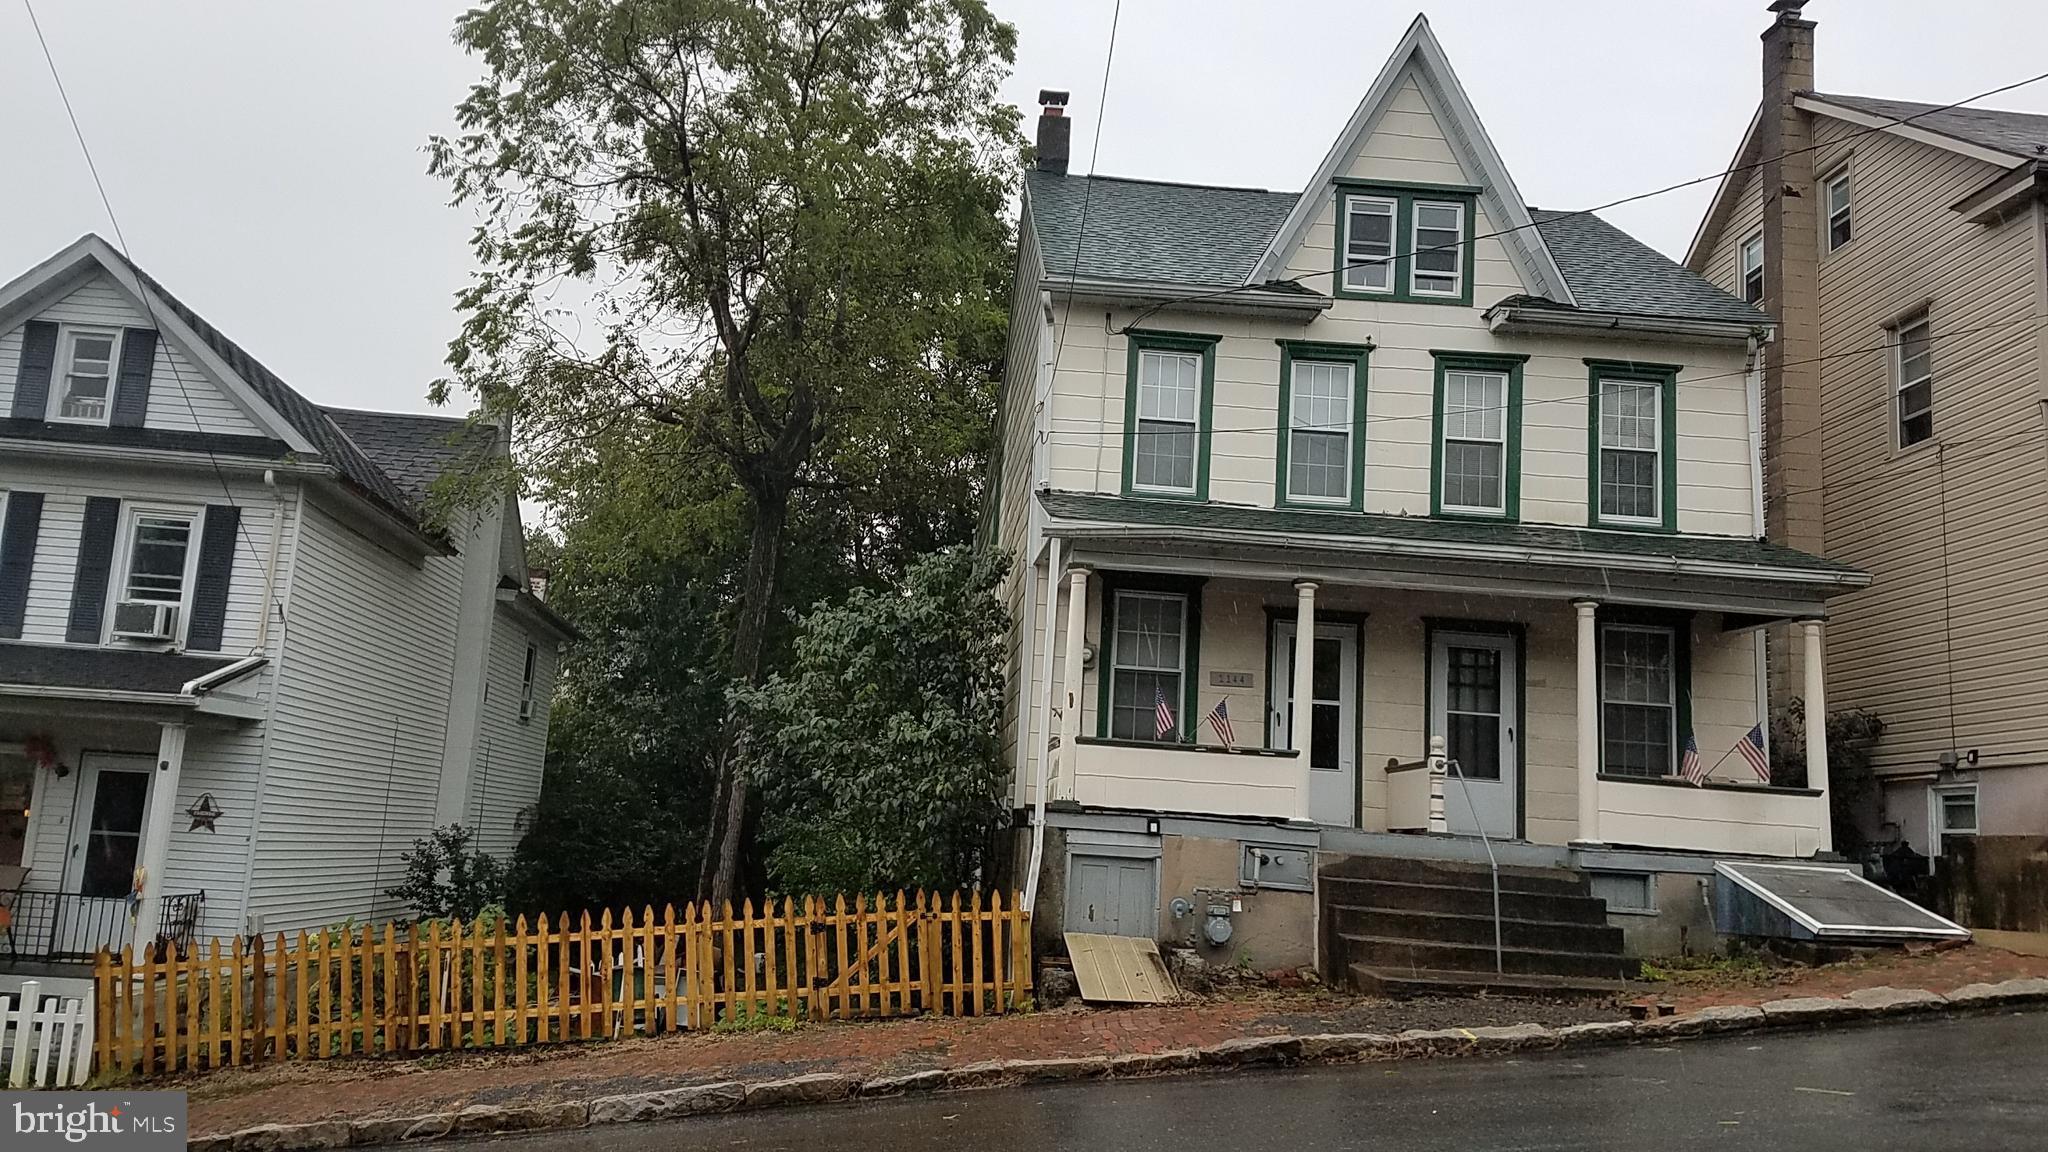 1144 W SPRUCE STREET, RANSHAW, PA 17866